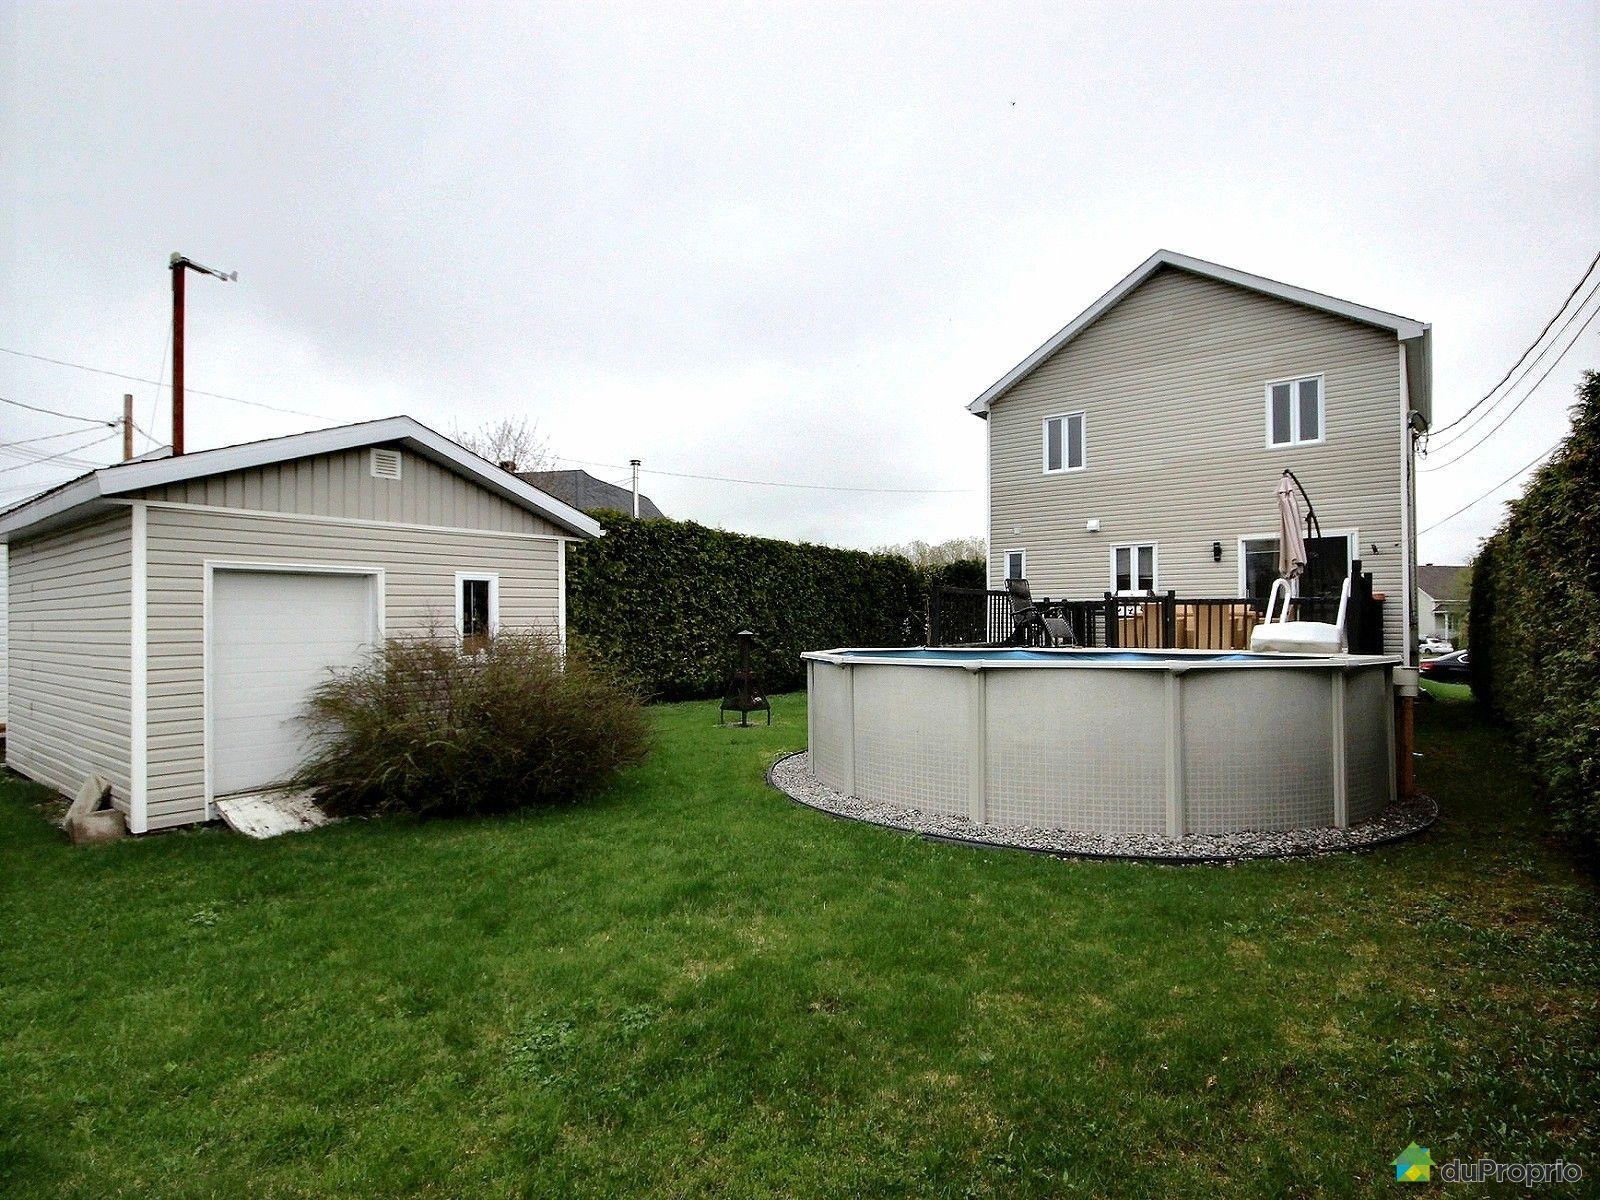 house for sale in st mile 1142 rue de ch teauneuf du pape duproprio 608384. Black Bedroom Furniture Sets. Home Design Ideas